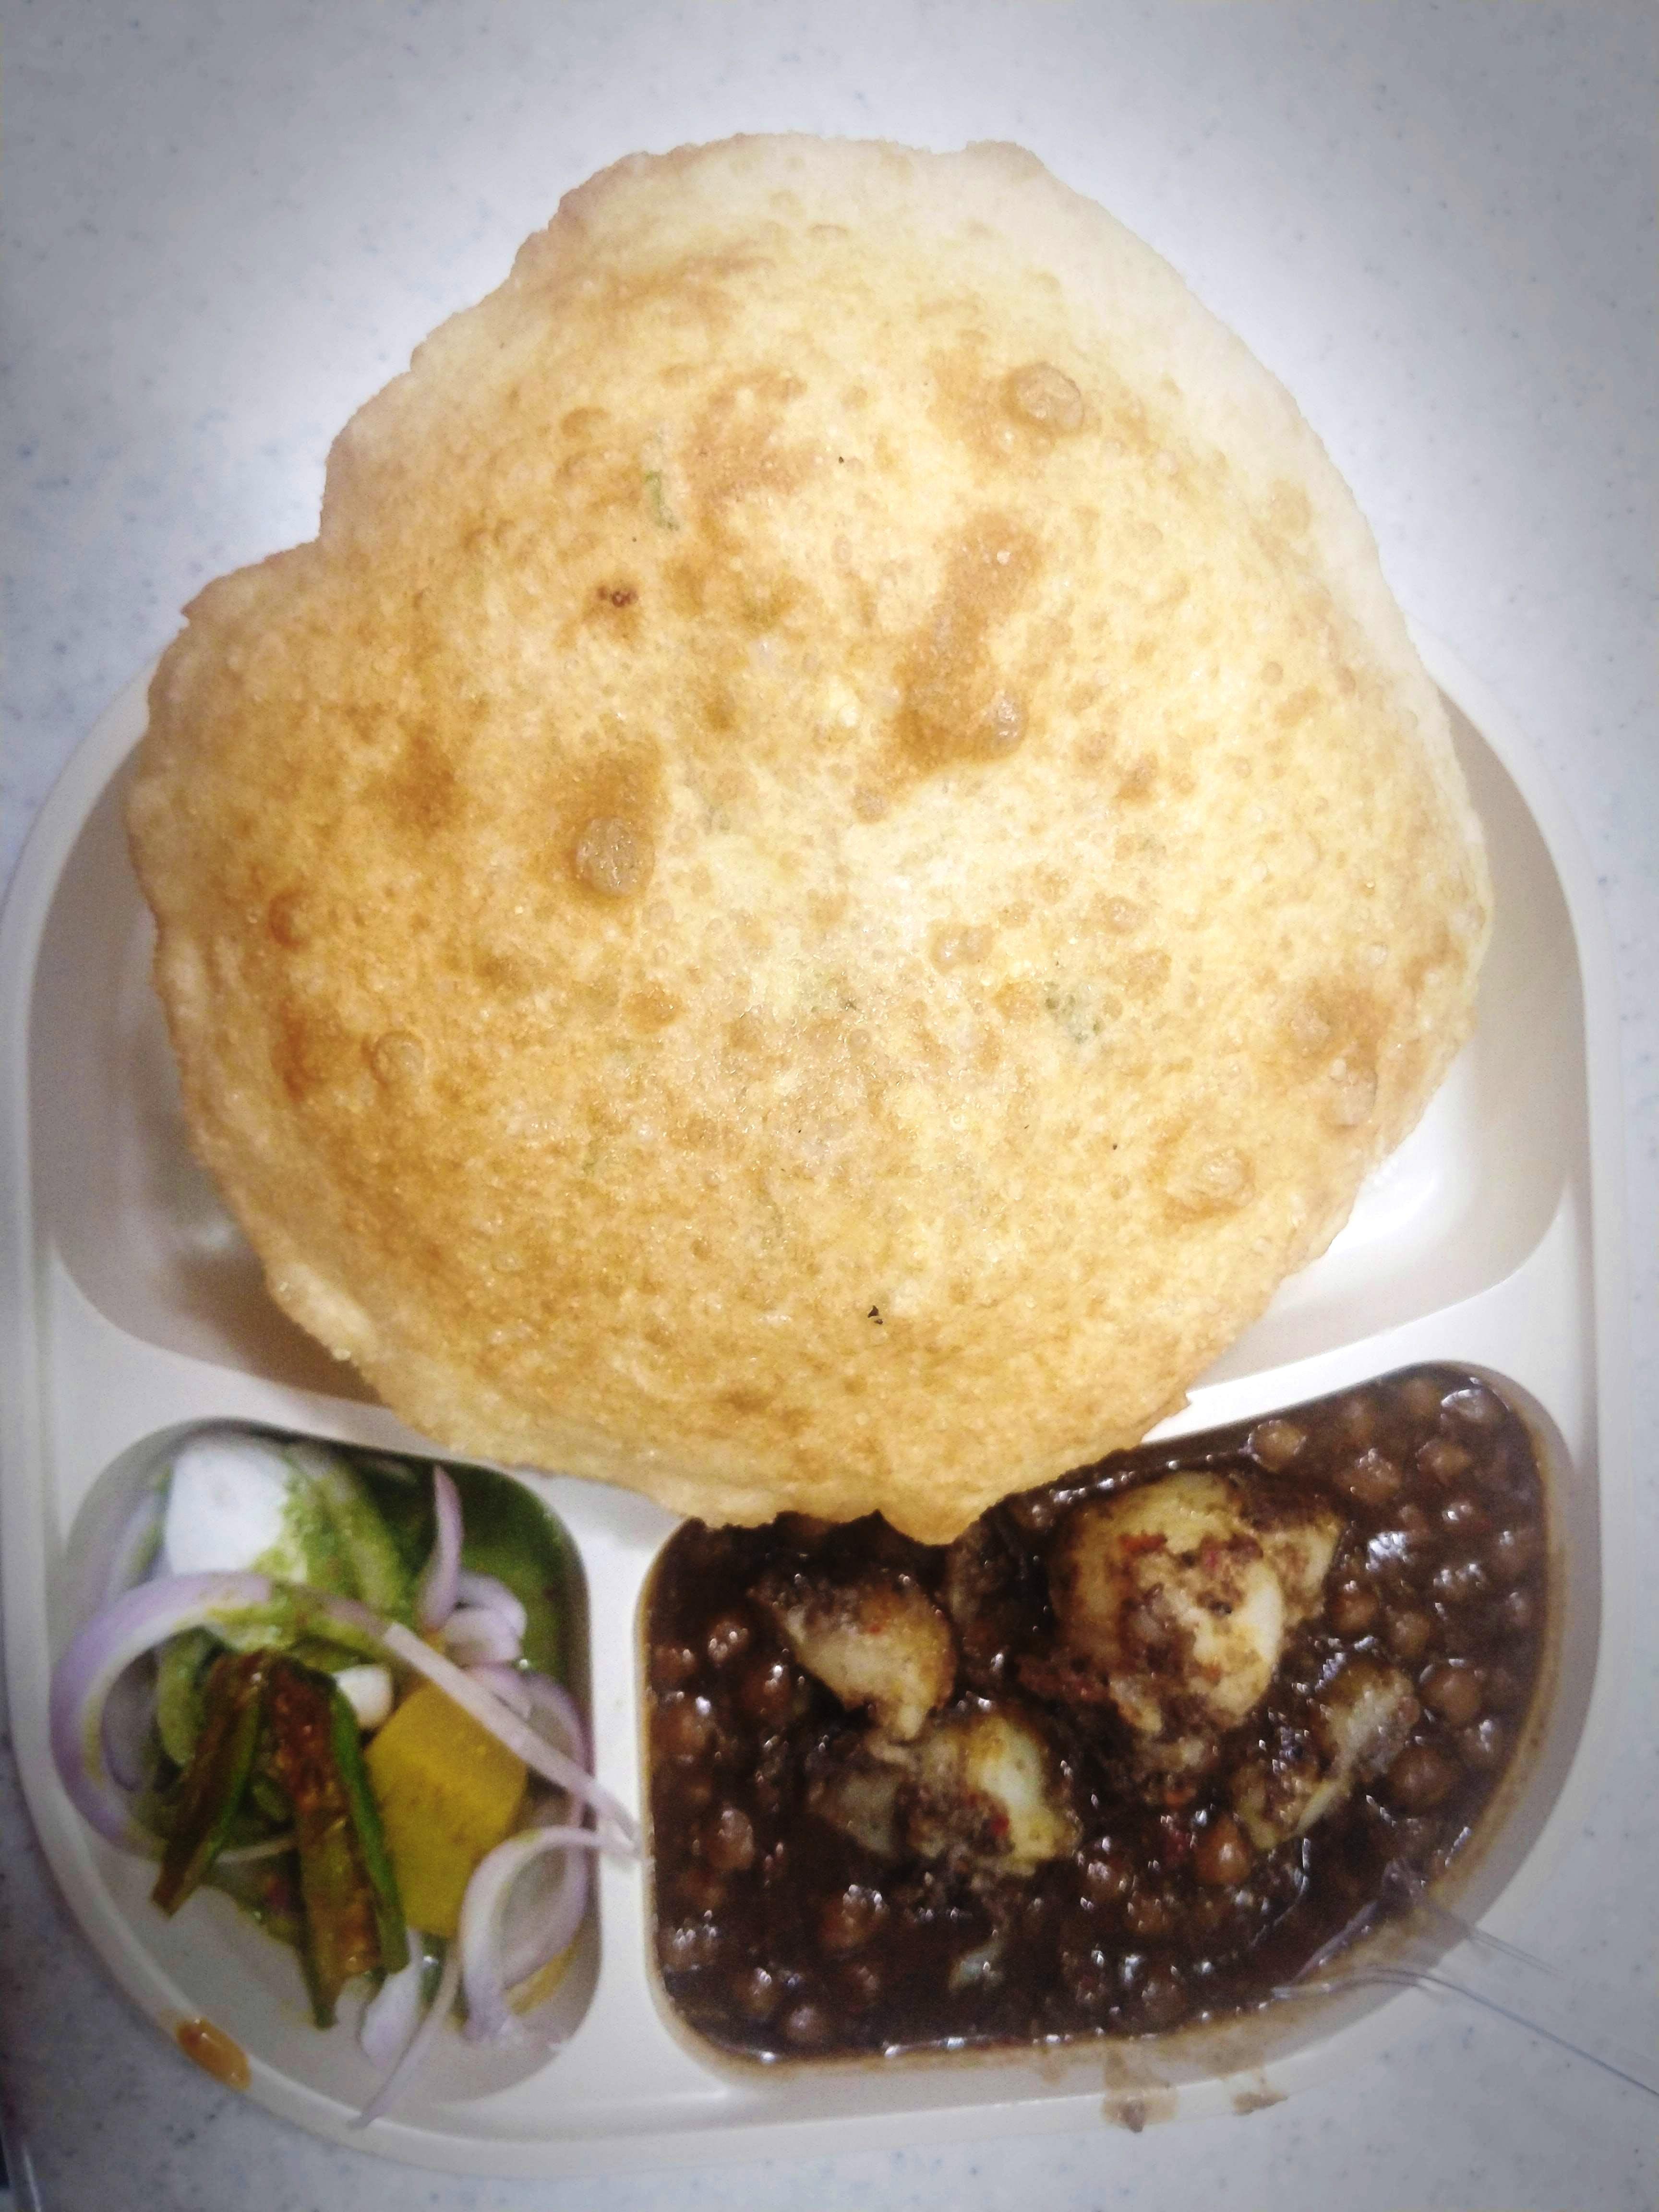 Dish,Food,Cuisine,Comfort food,Ingredient,Chole bhature,Produce,Hoppang,Oyaki,Recipe